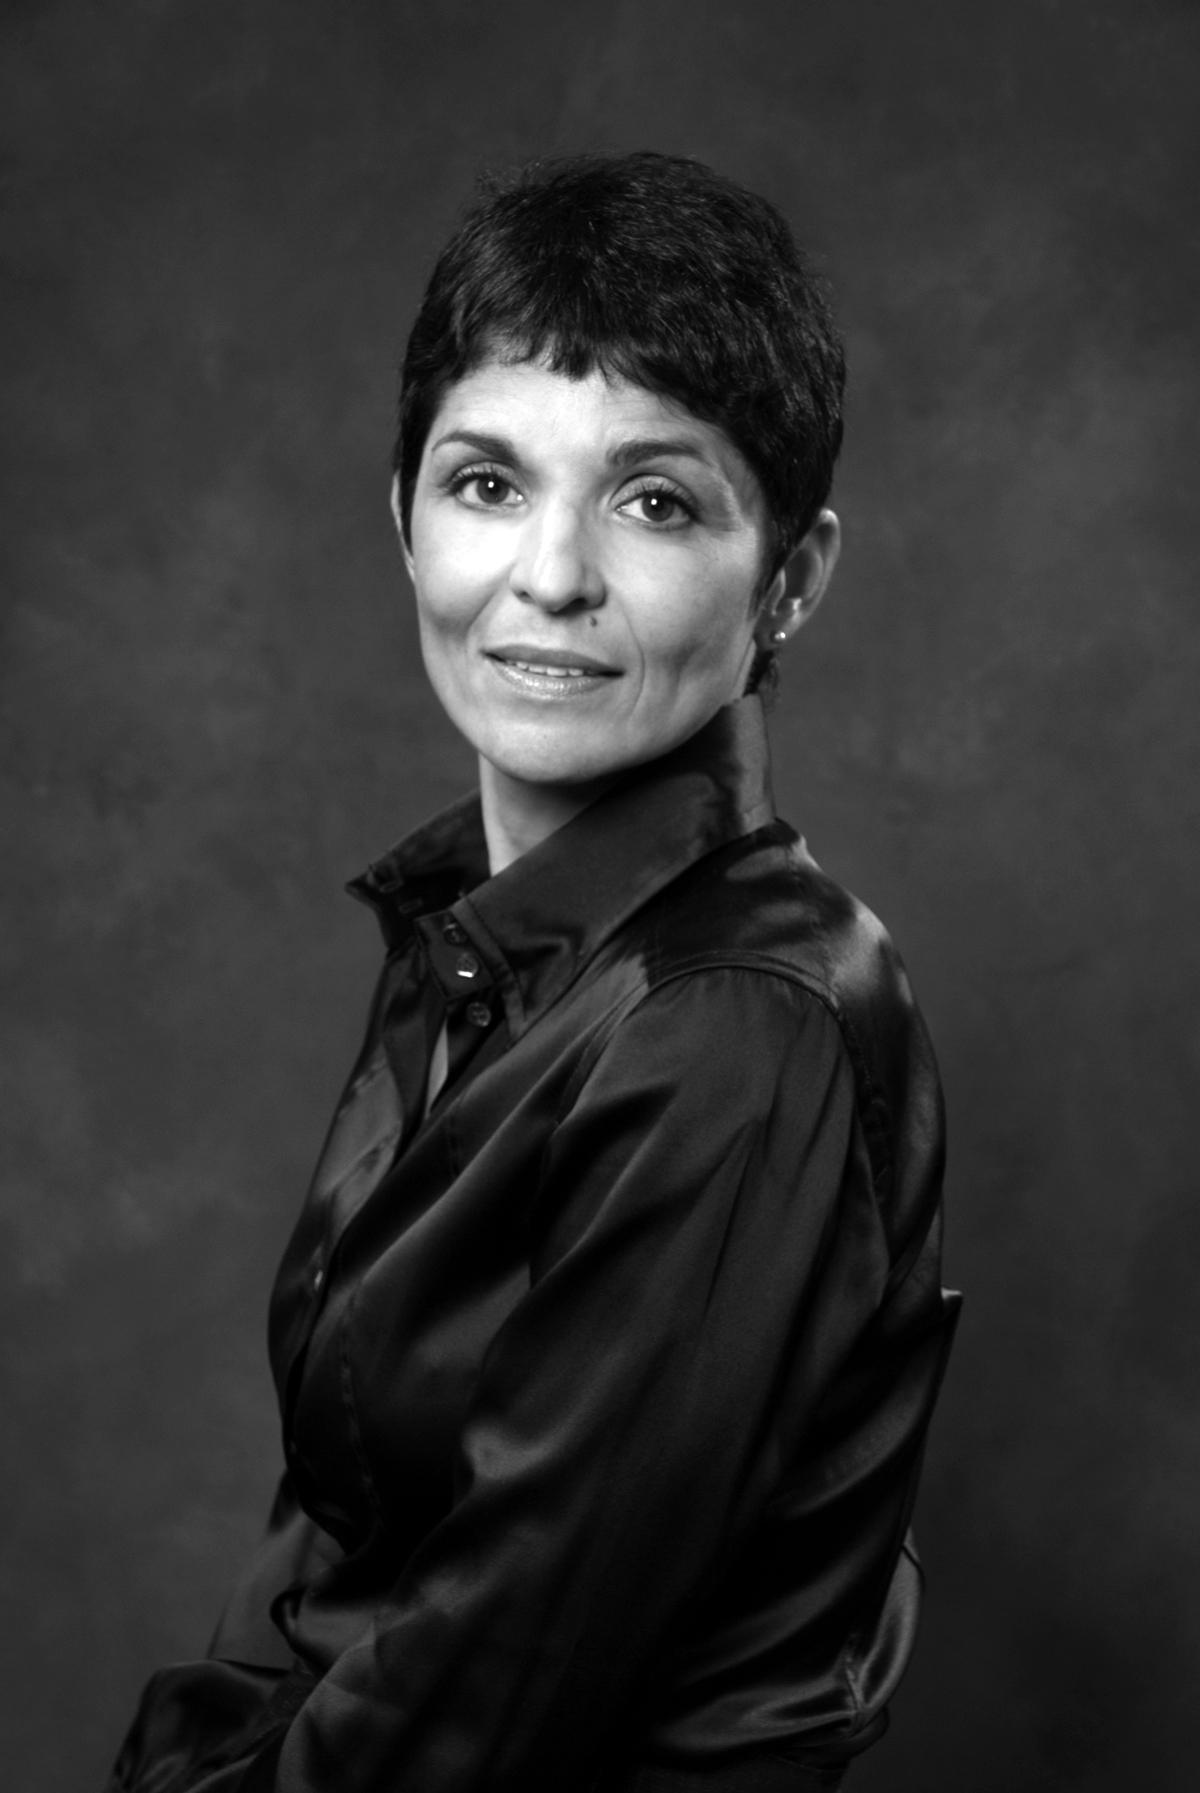 Véronique Gaspard-Charlet (2008)